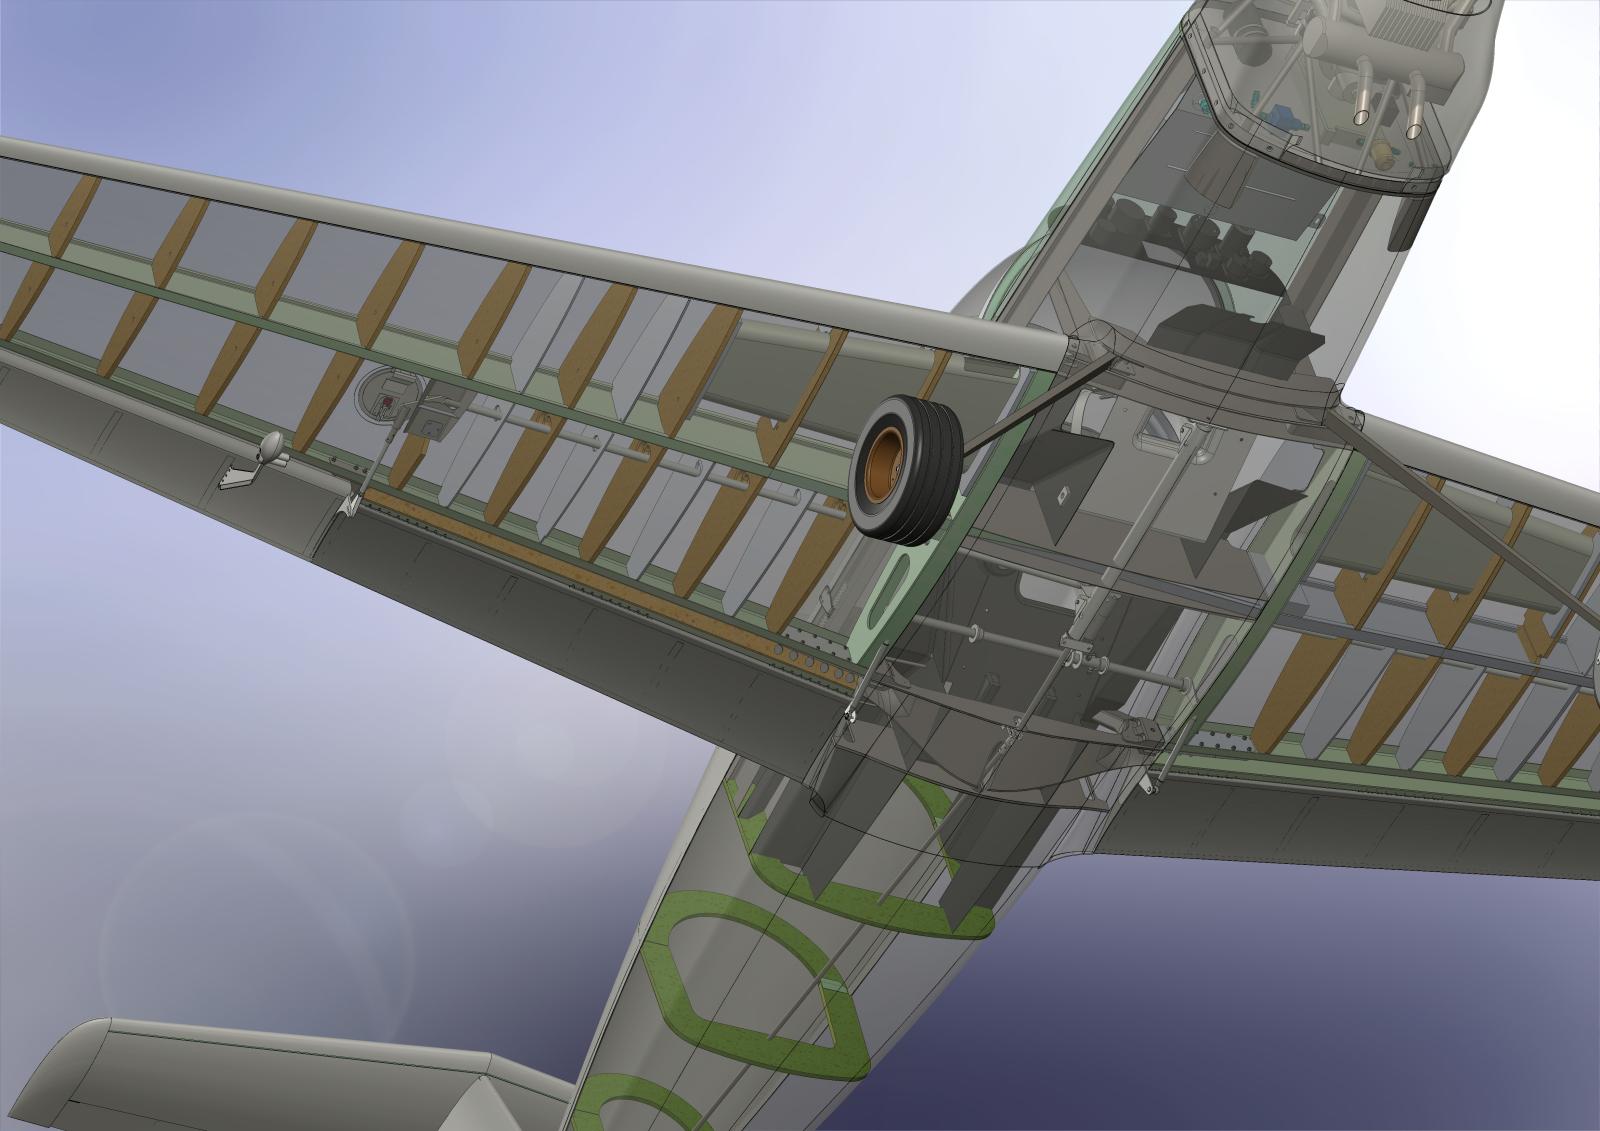 V-King Kingfisher KF2200 -Exclusivo Defensa Nacional y del Mundo- 2nbzsyg